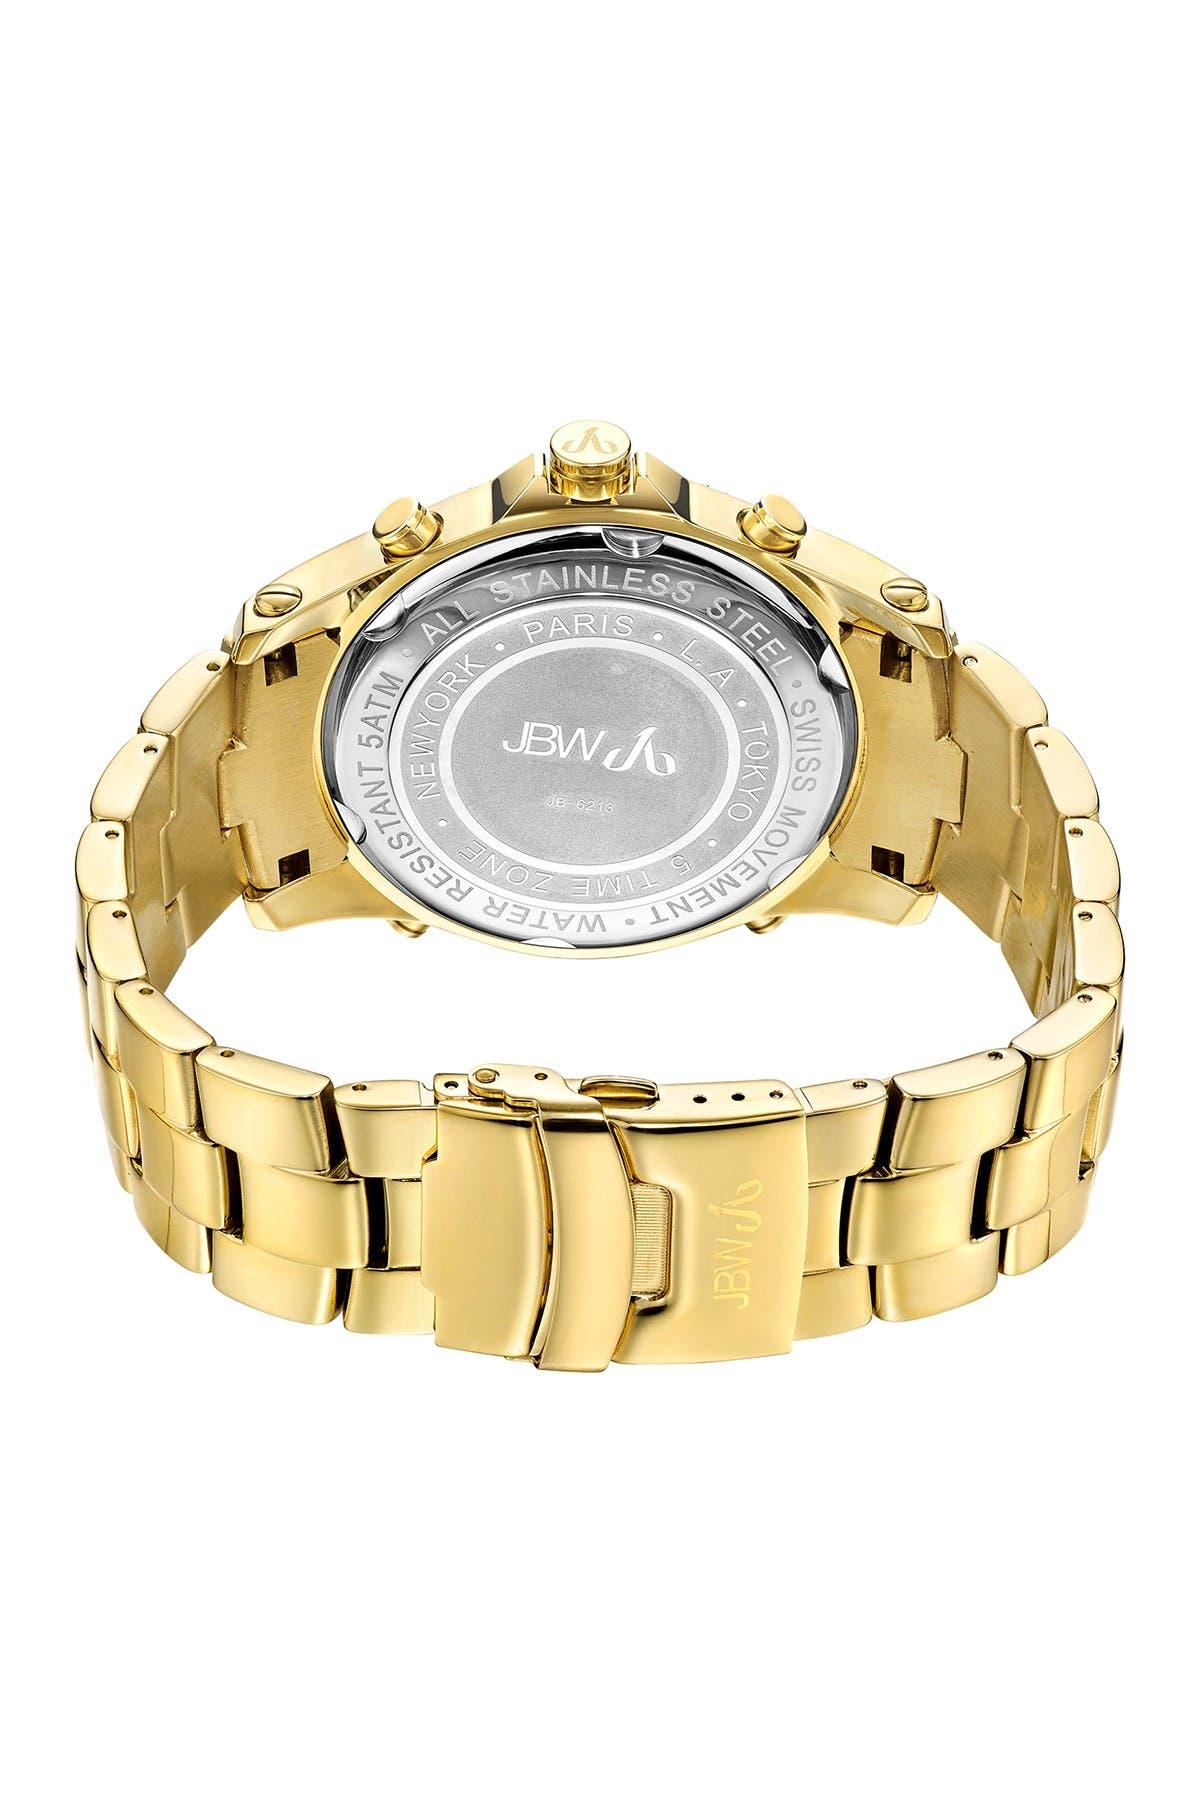 Image of JBW Men's Jet Setter Diamond Watch, 50mm - 2.34 ctw